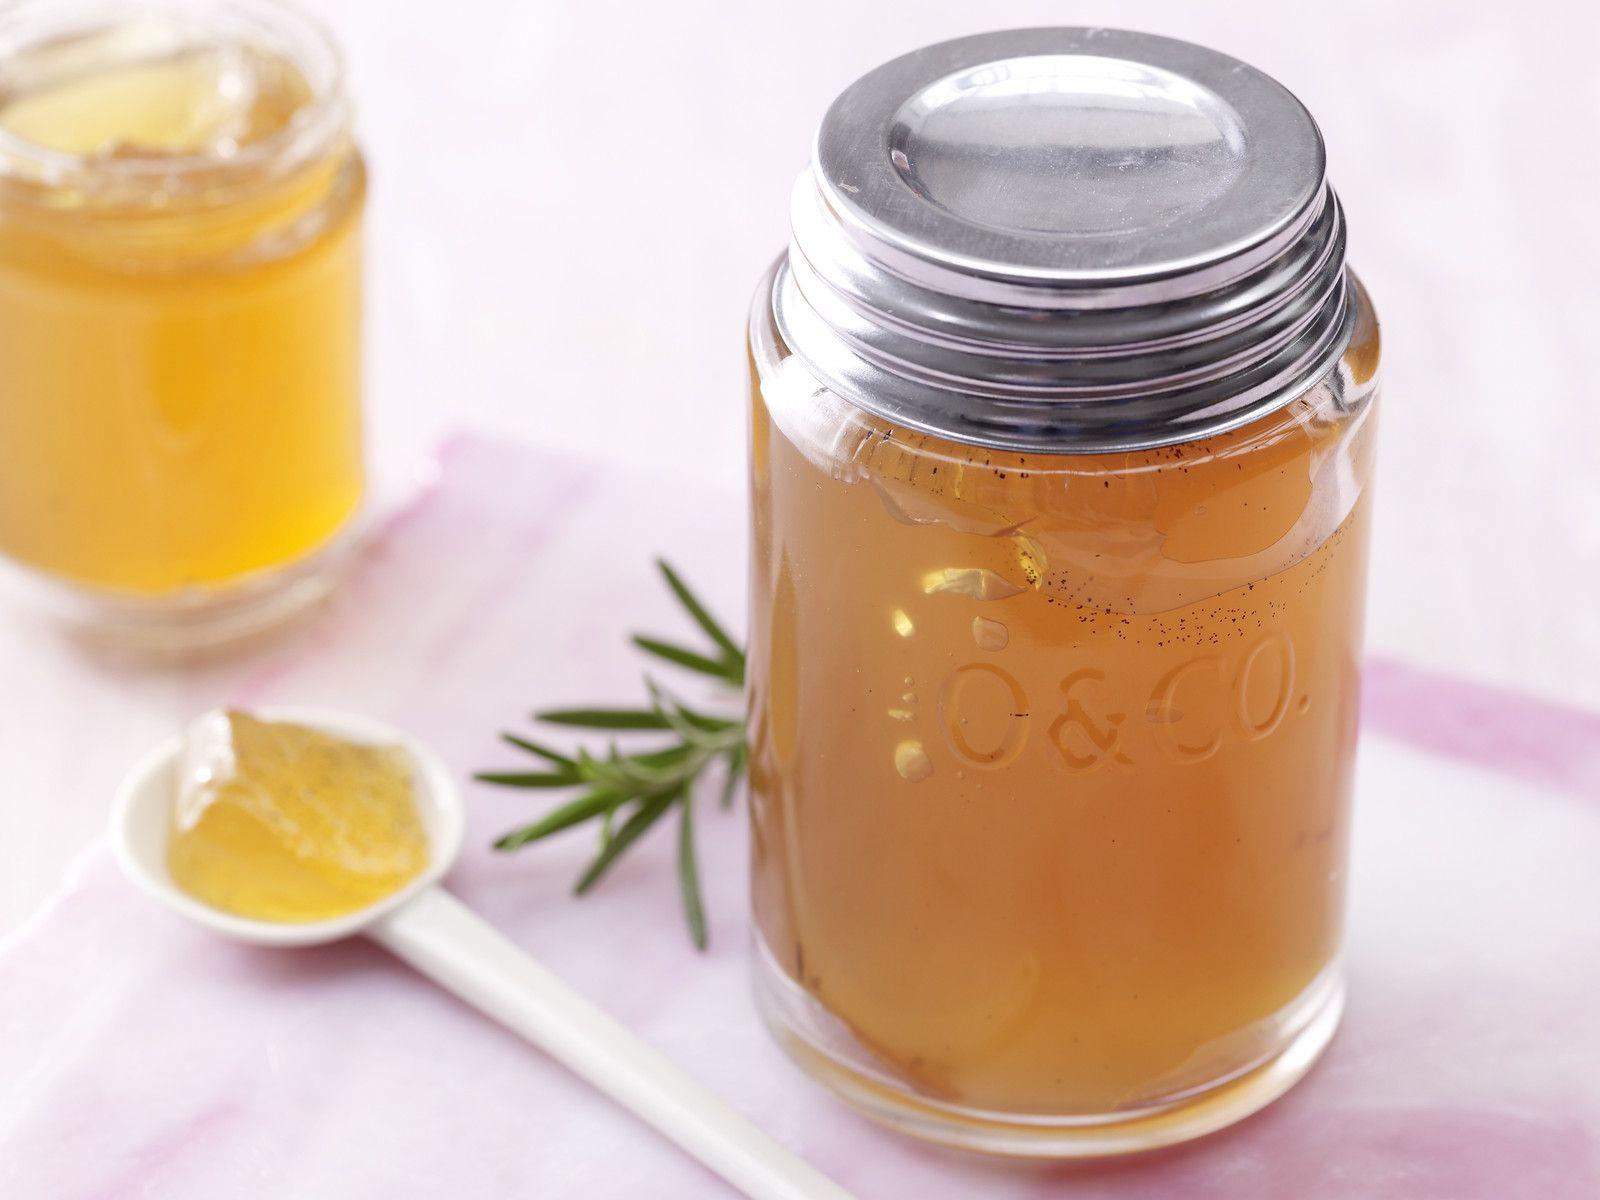 Apfel-Rosmarin-Gelee | Rezept | Food | Gelee, Apple ...